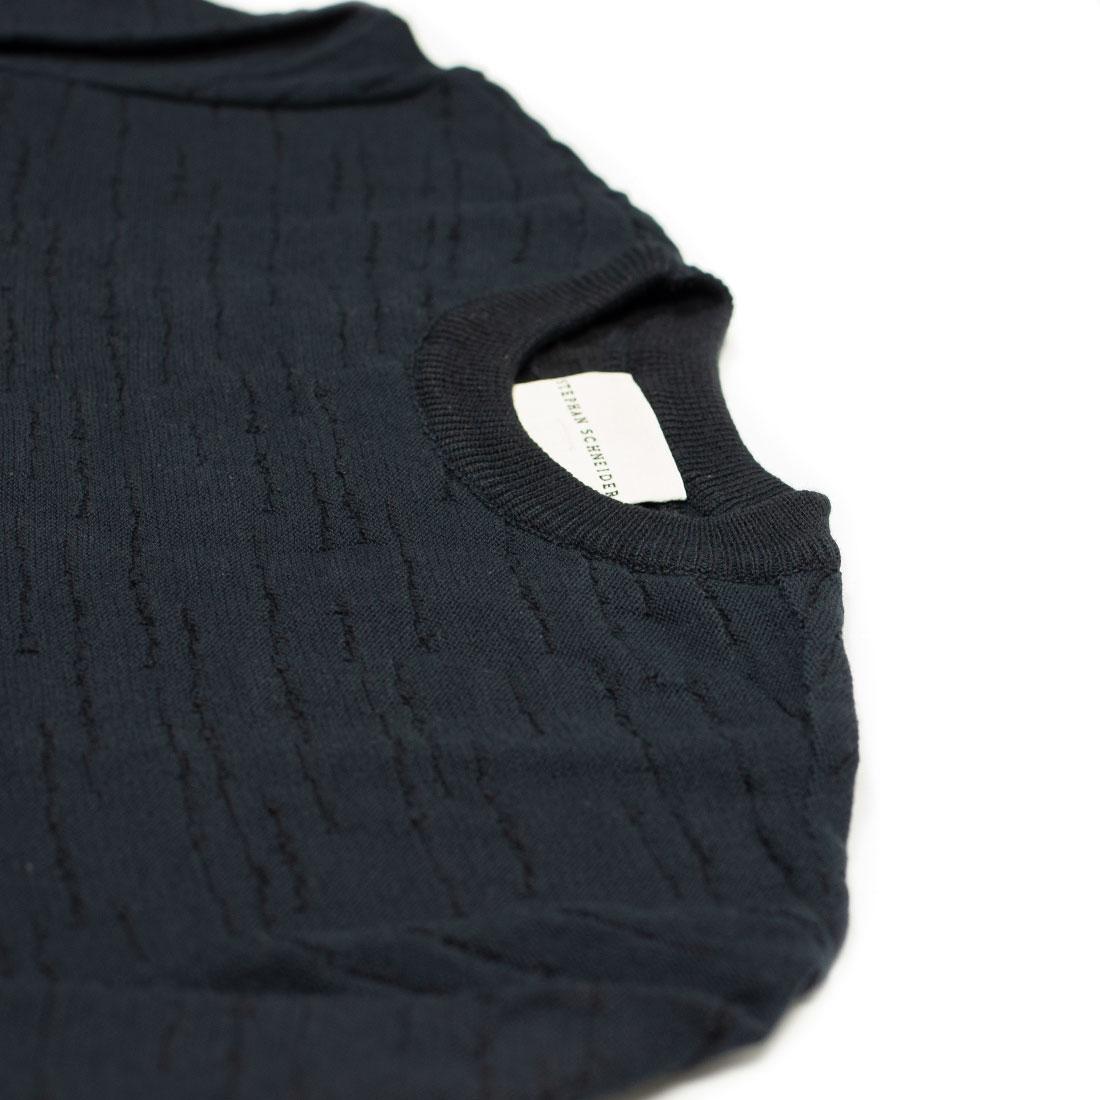 Stephan Schneider Spring Summer 2021 SS21 Crewneck sweater (3).jpg